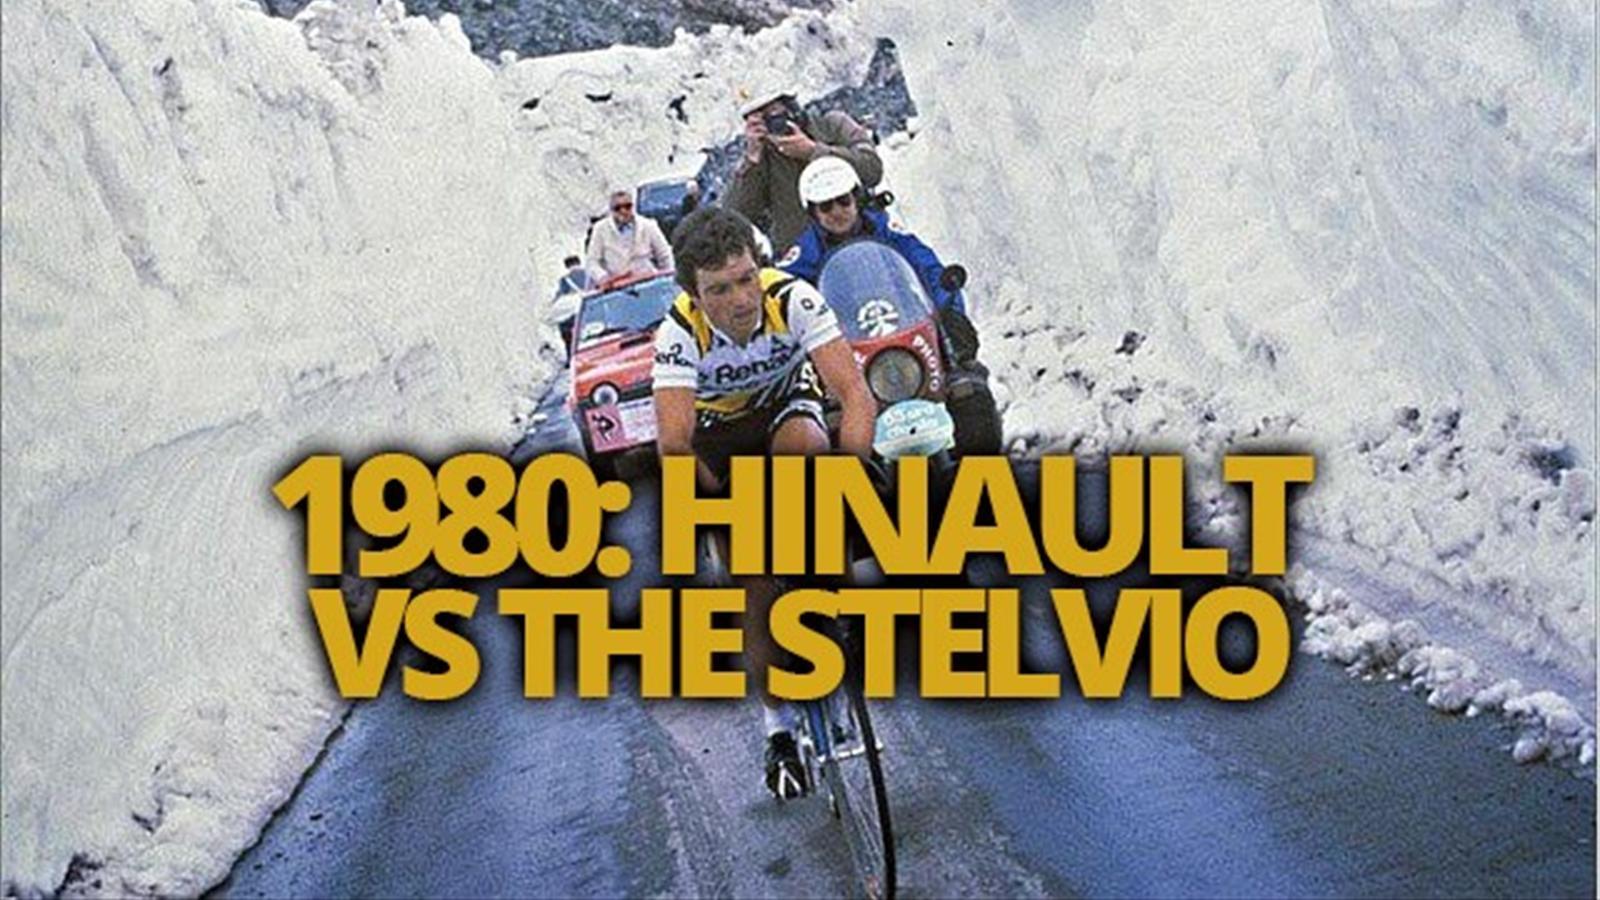 VIDEO - Hinault v the Stelvio: An epic assault in 1980 - Giro d'Italia - Video Eurosport